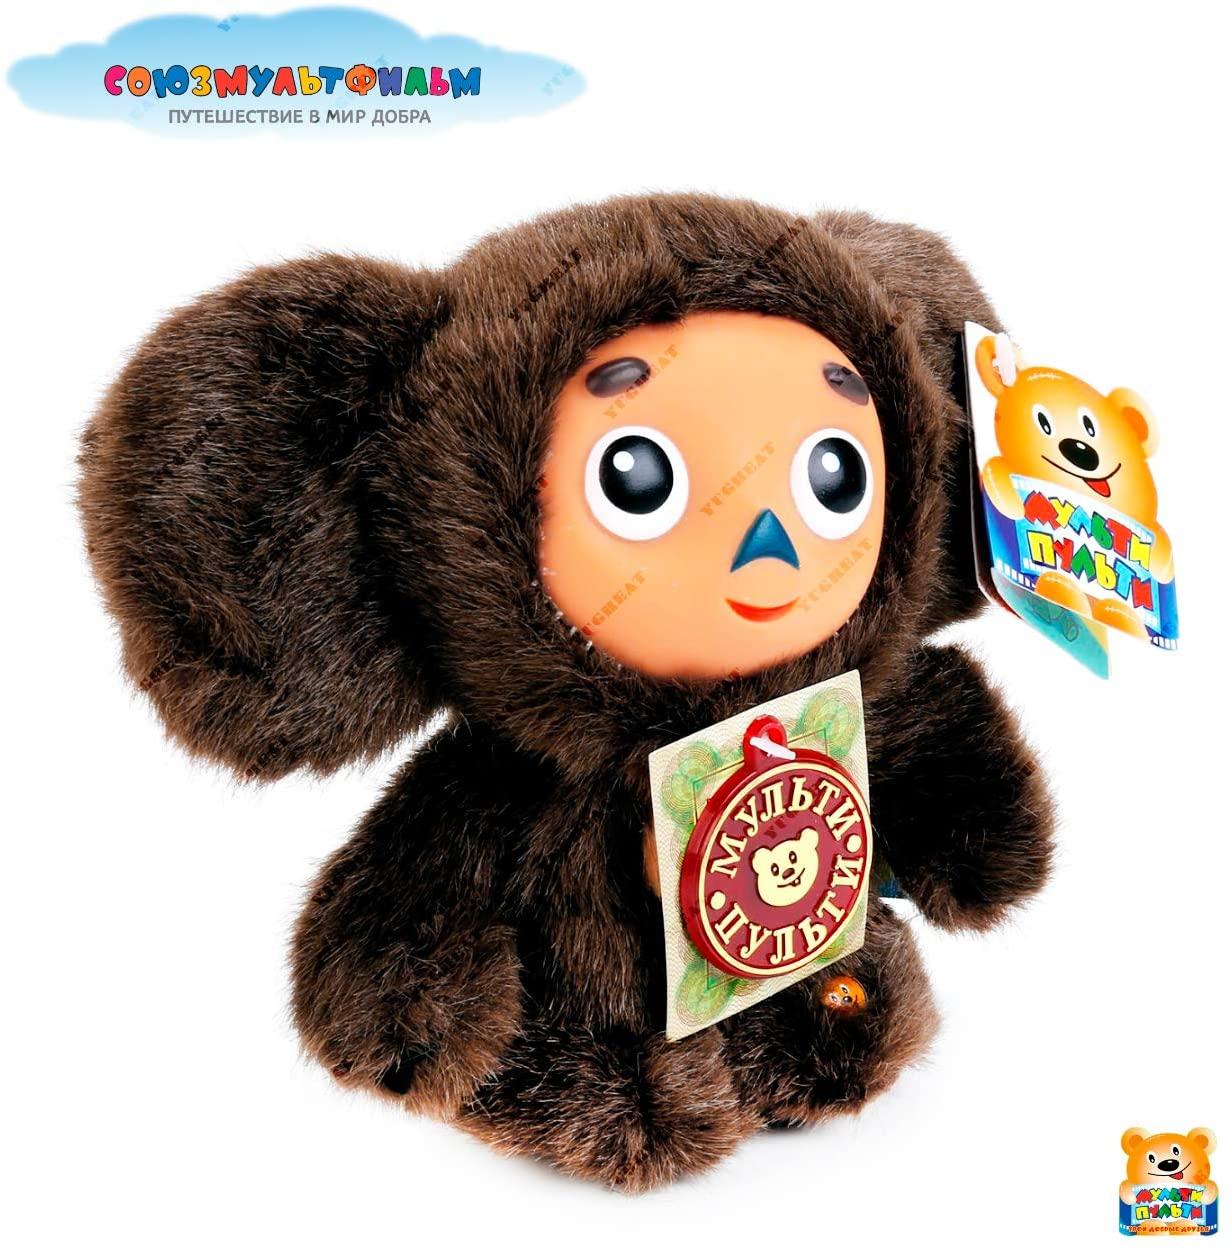 Cheburashka Soft Plush Russian Speaking Toy Classic 17cm (7) by Multi-Pulti